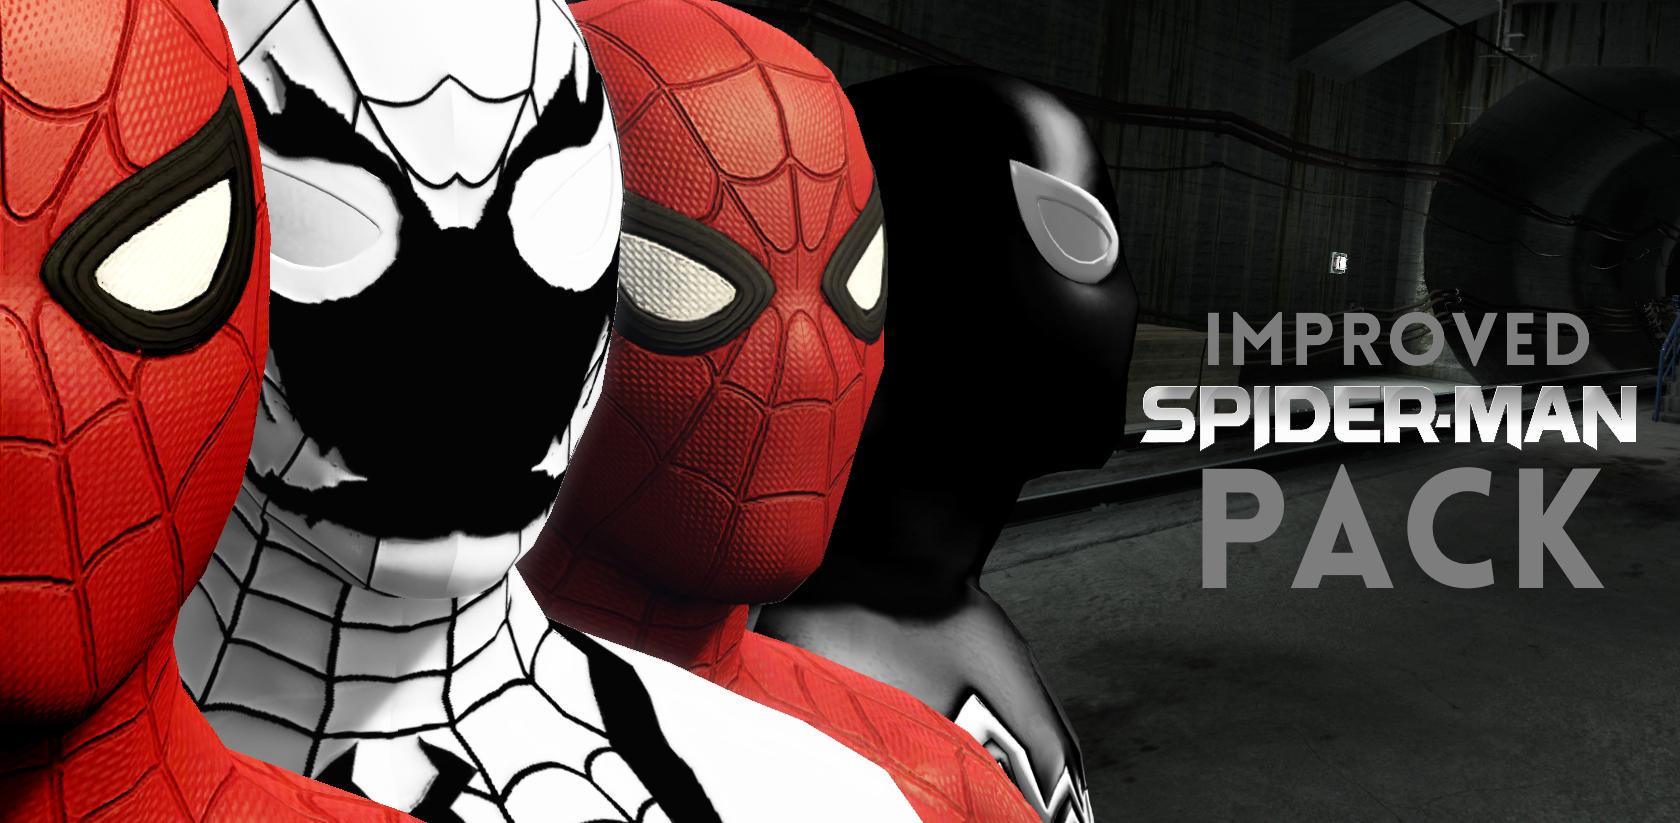 improved spider-man (homecoming, civil war, symbiote & anti-venom